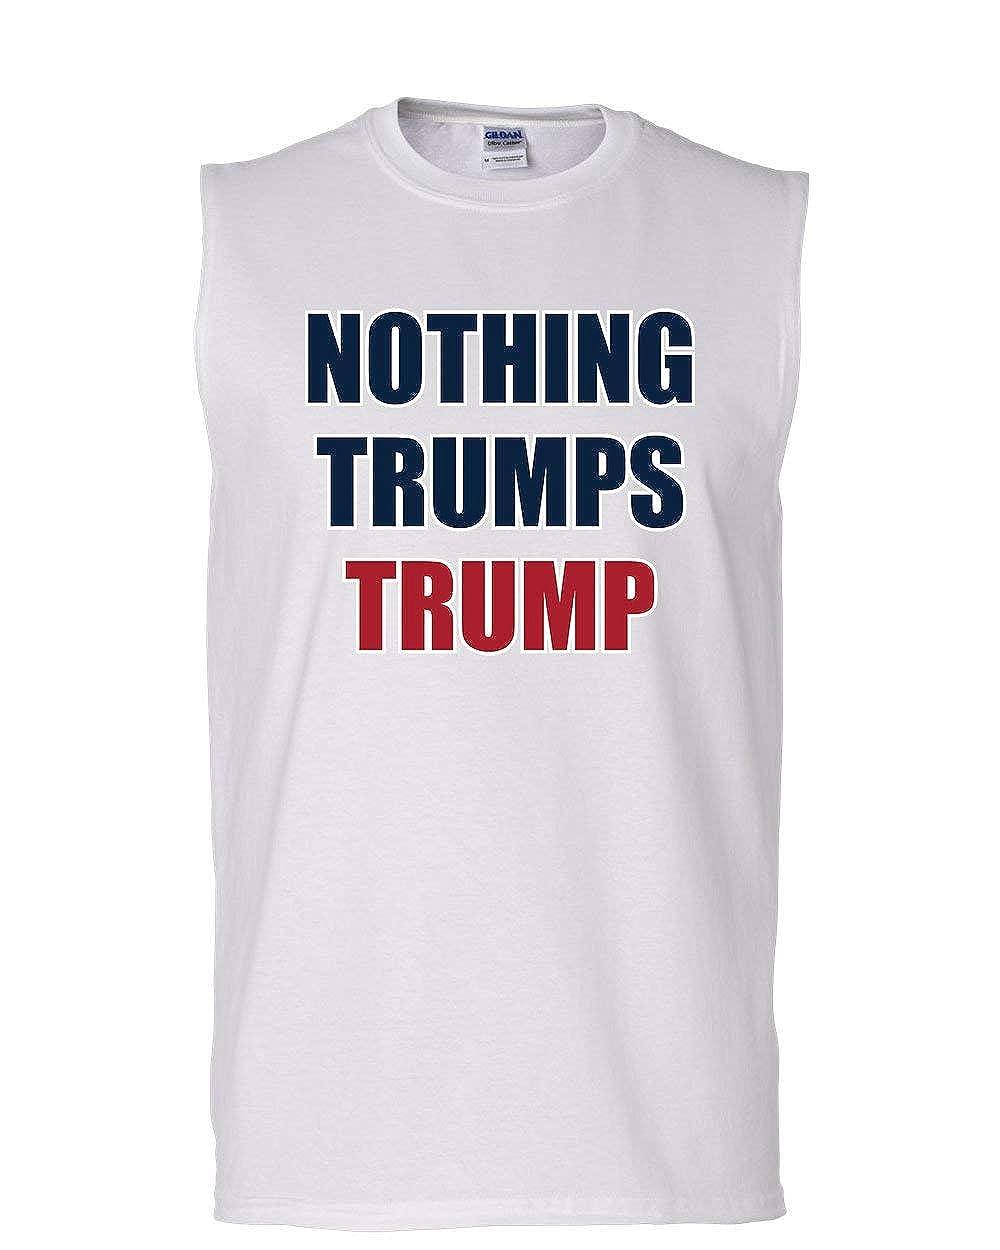 Tee Hunt Nothing Trumps Trump Muscle Shirt Funny Keep America Great MAGA 45 Sleeveless